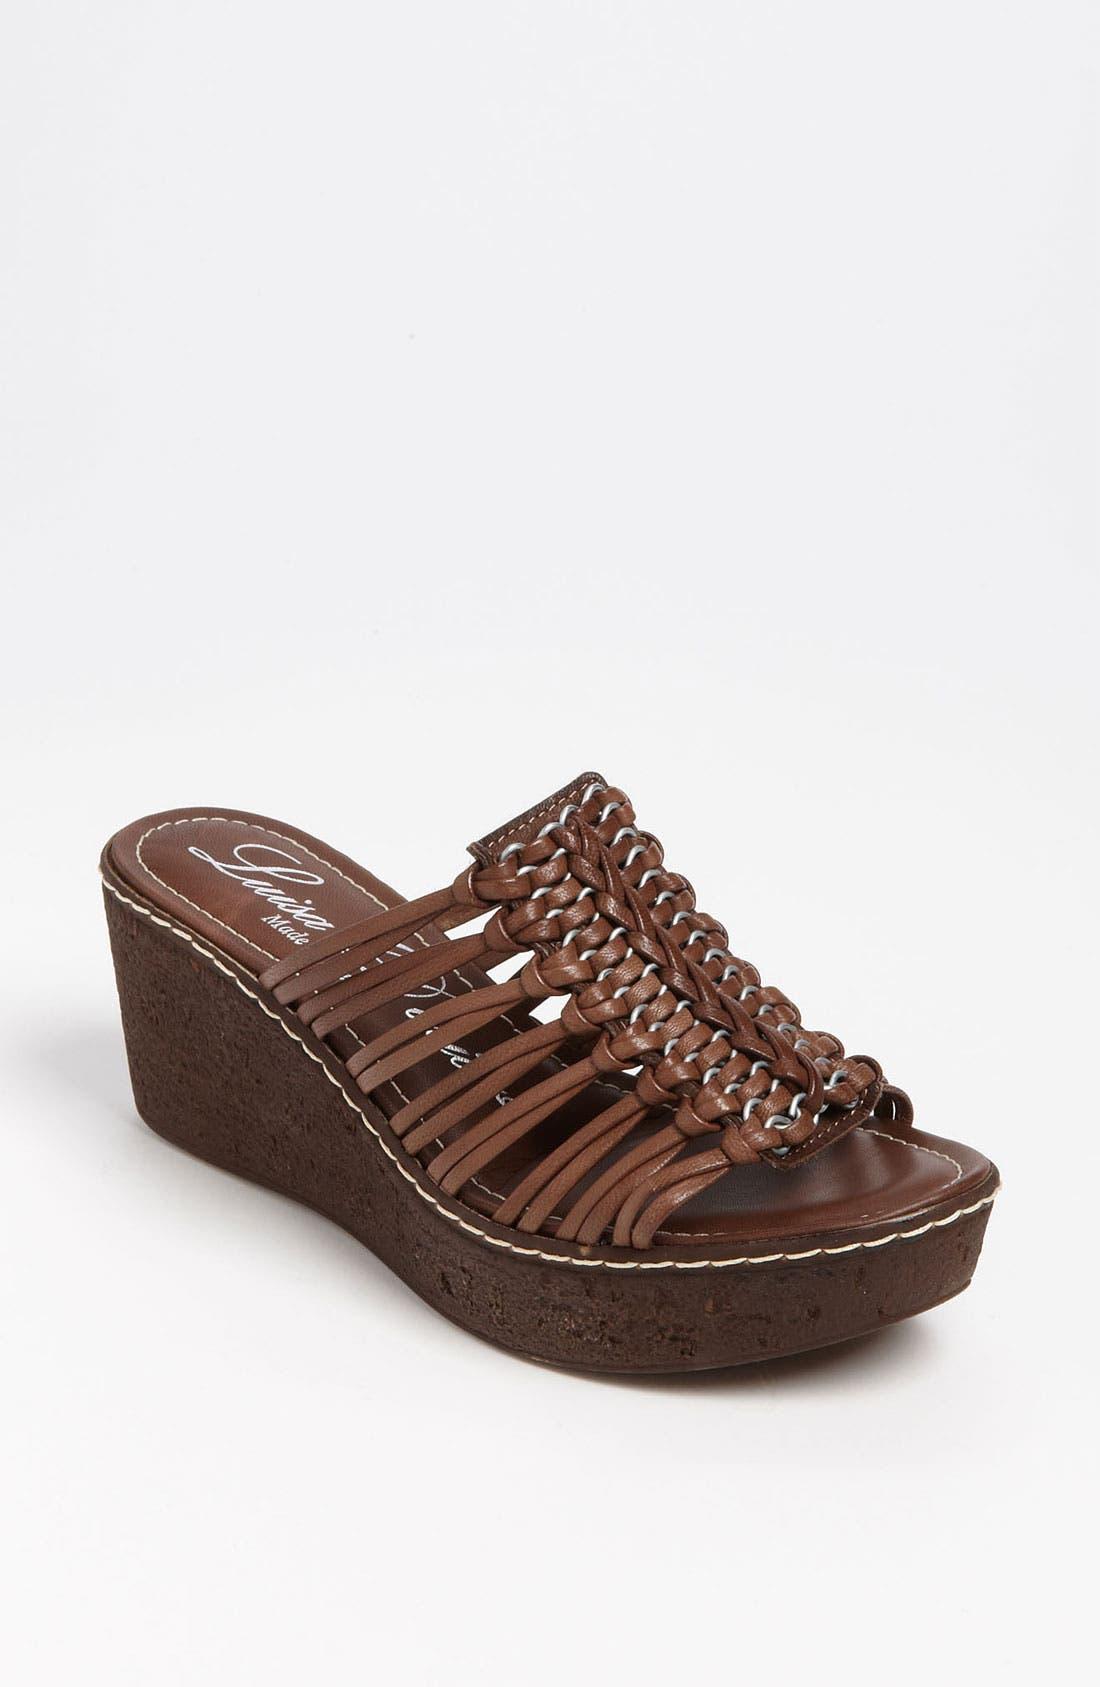 Alternate Image 1 Selected - Luisa D'orio 'Design' Sandal